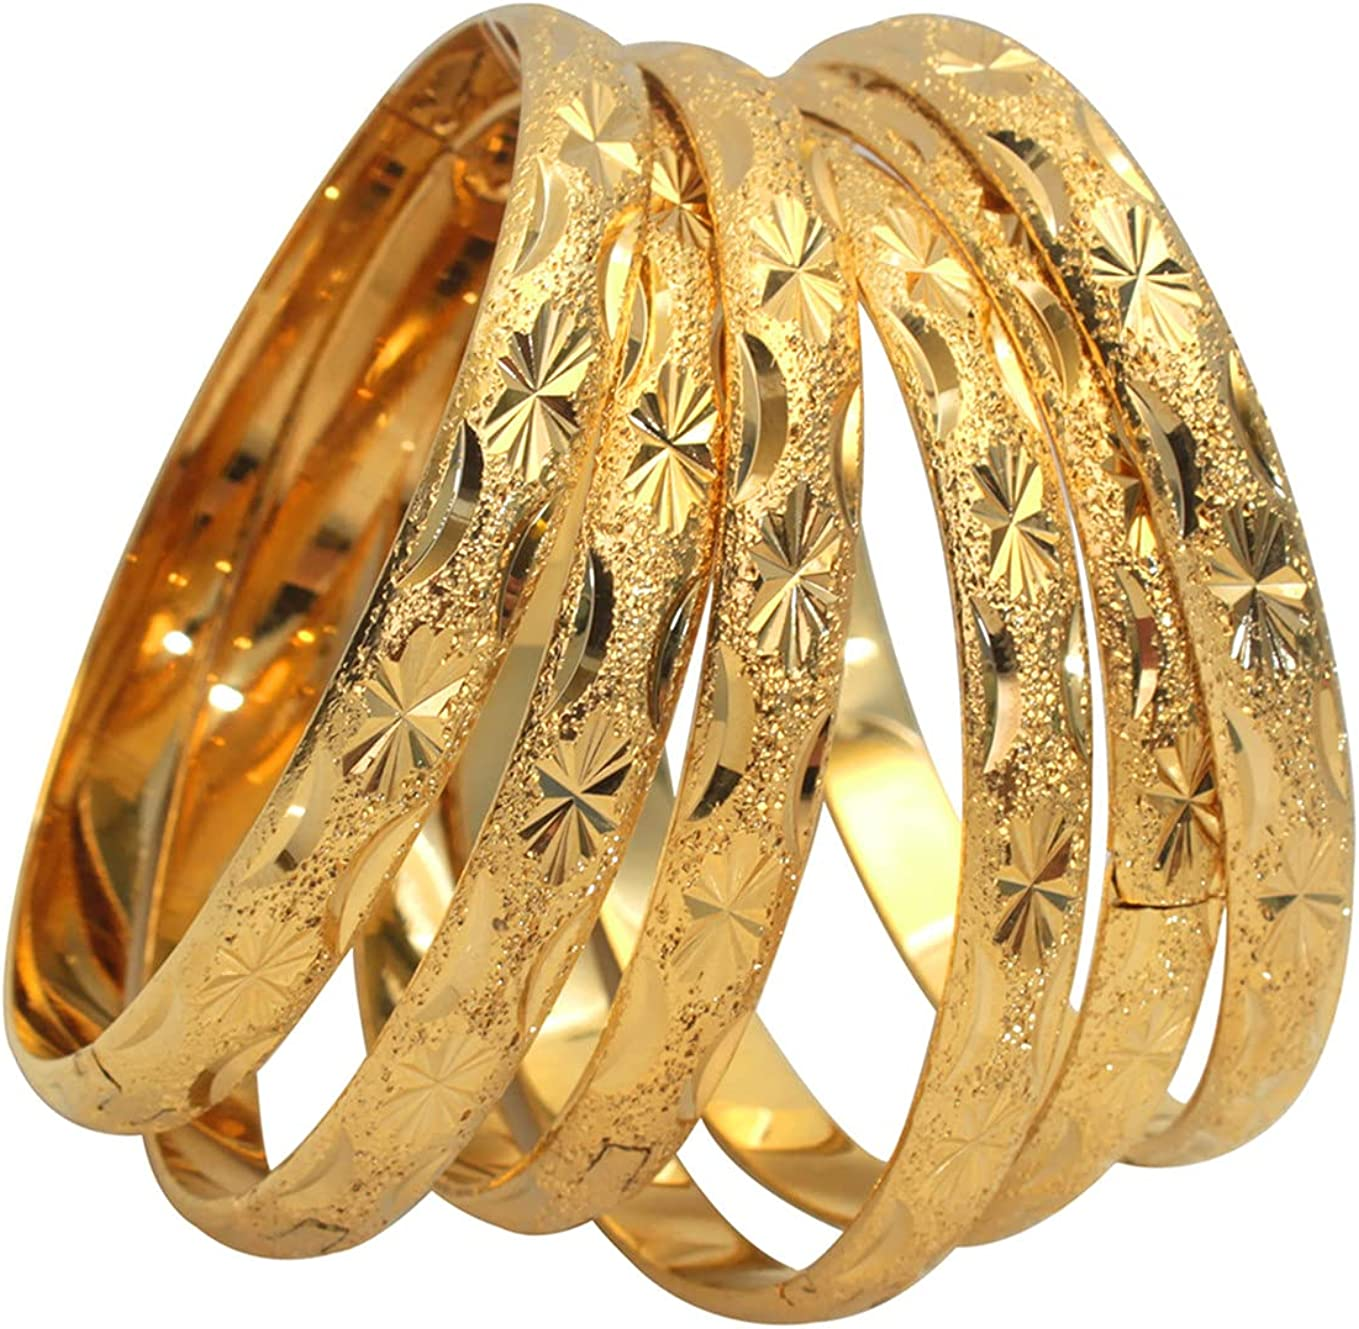 NC 6 Pcs/Pack African Bangle Bracelet for Women 18k Gold Plated Copper Open Design Bangle Bracelets Jewelry, 2.6